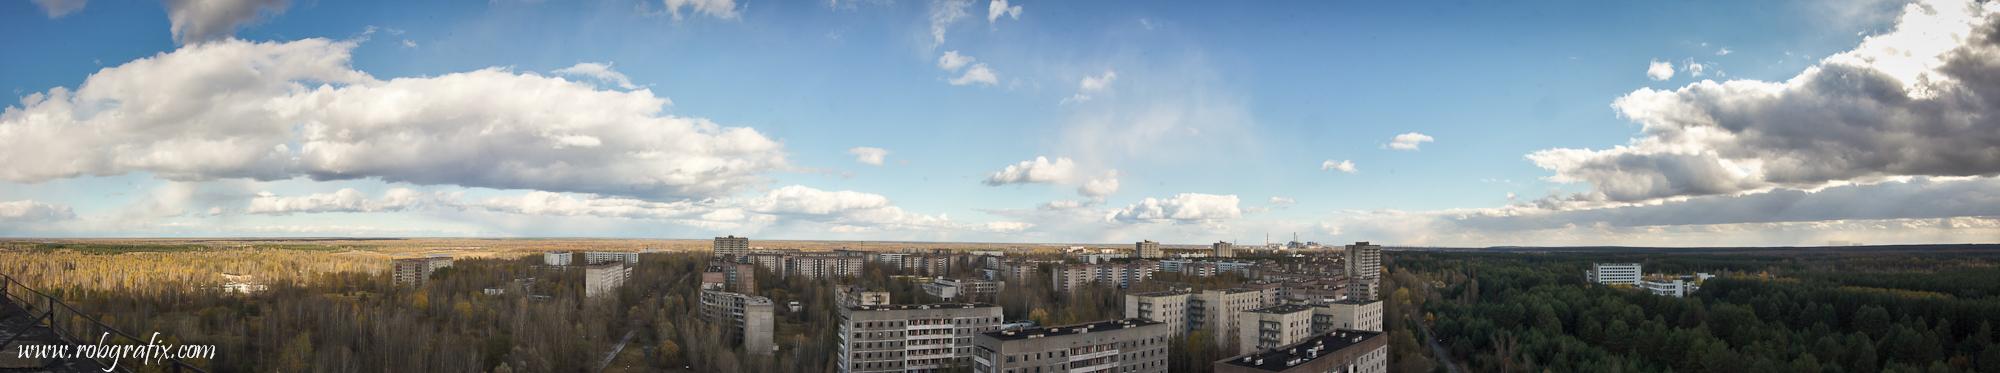 Chernobyl/pripyat 2012 Panorama by Robgrafix